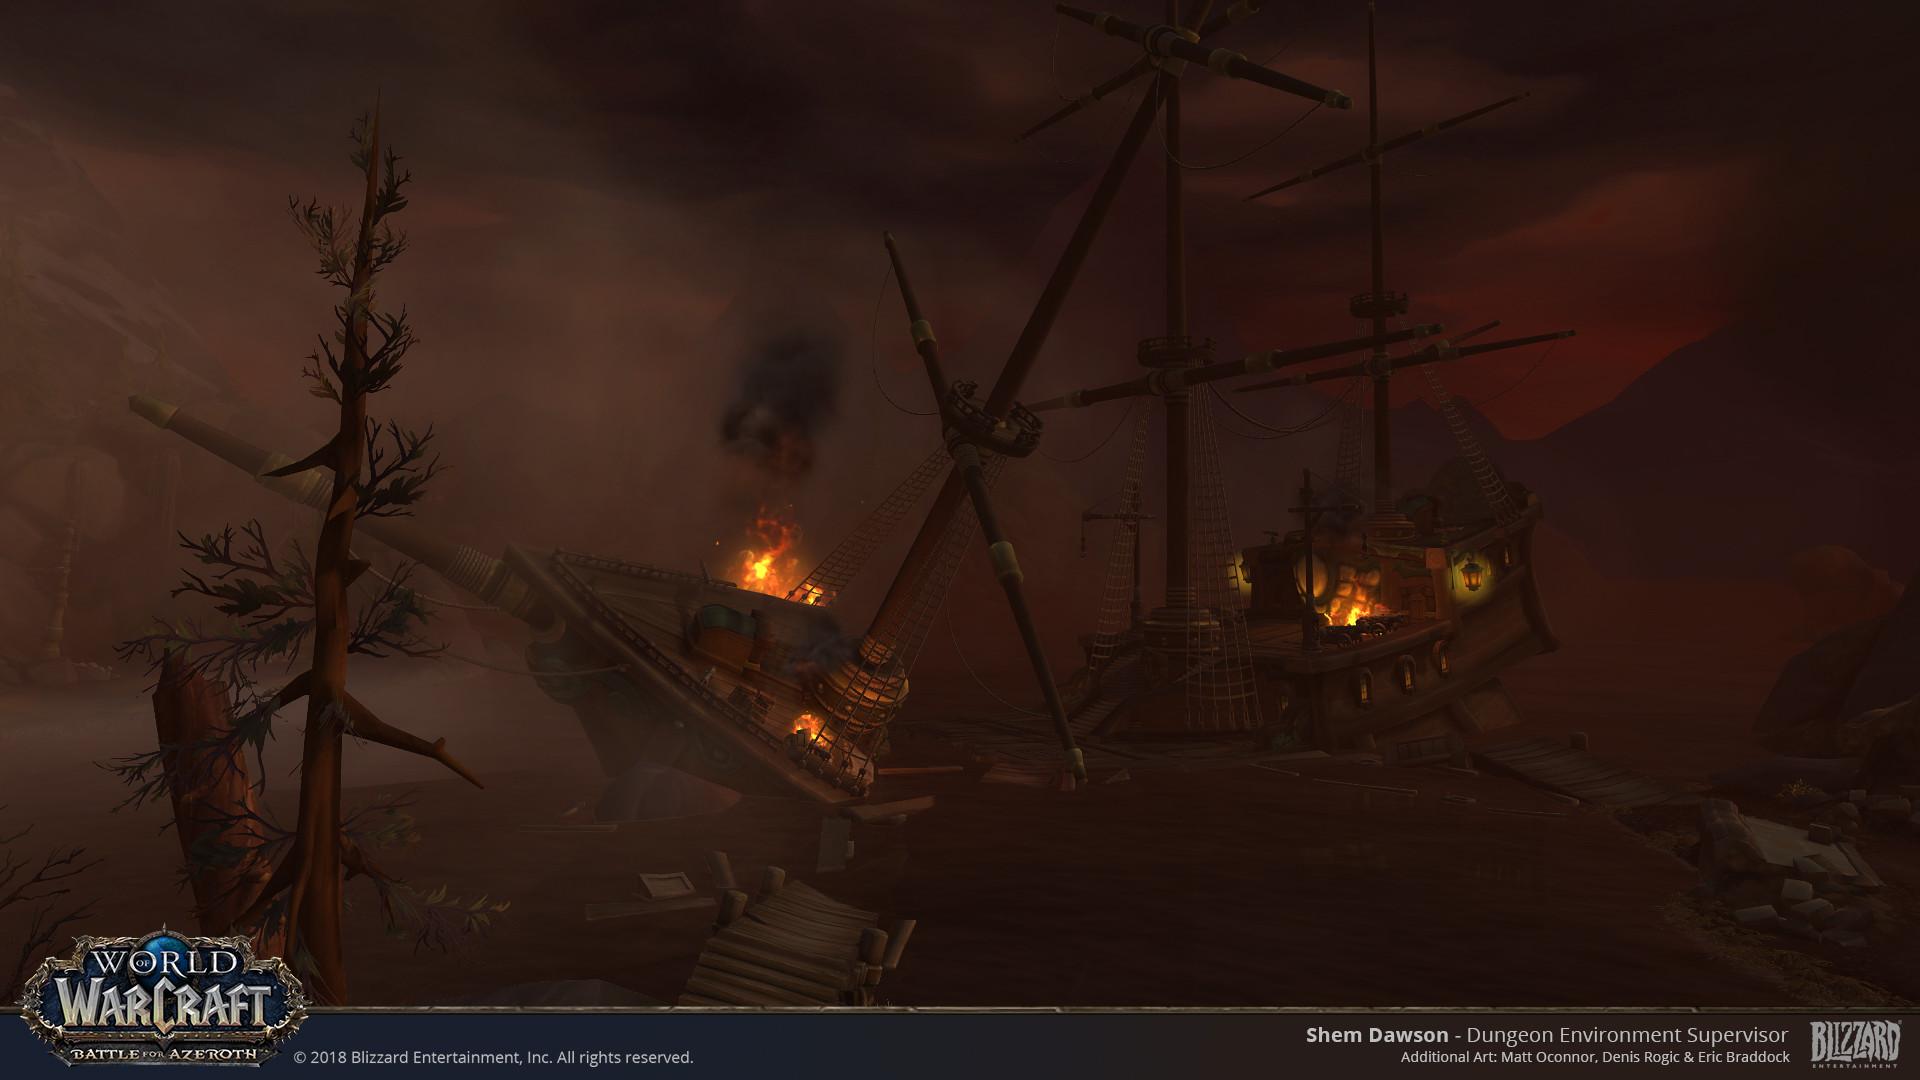 Shem dawson shem dawson shipwreck07